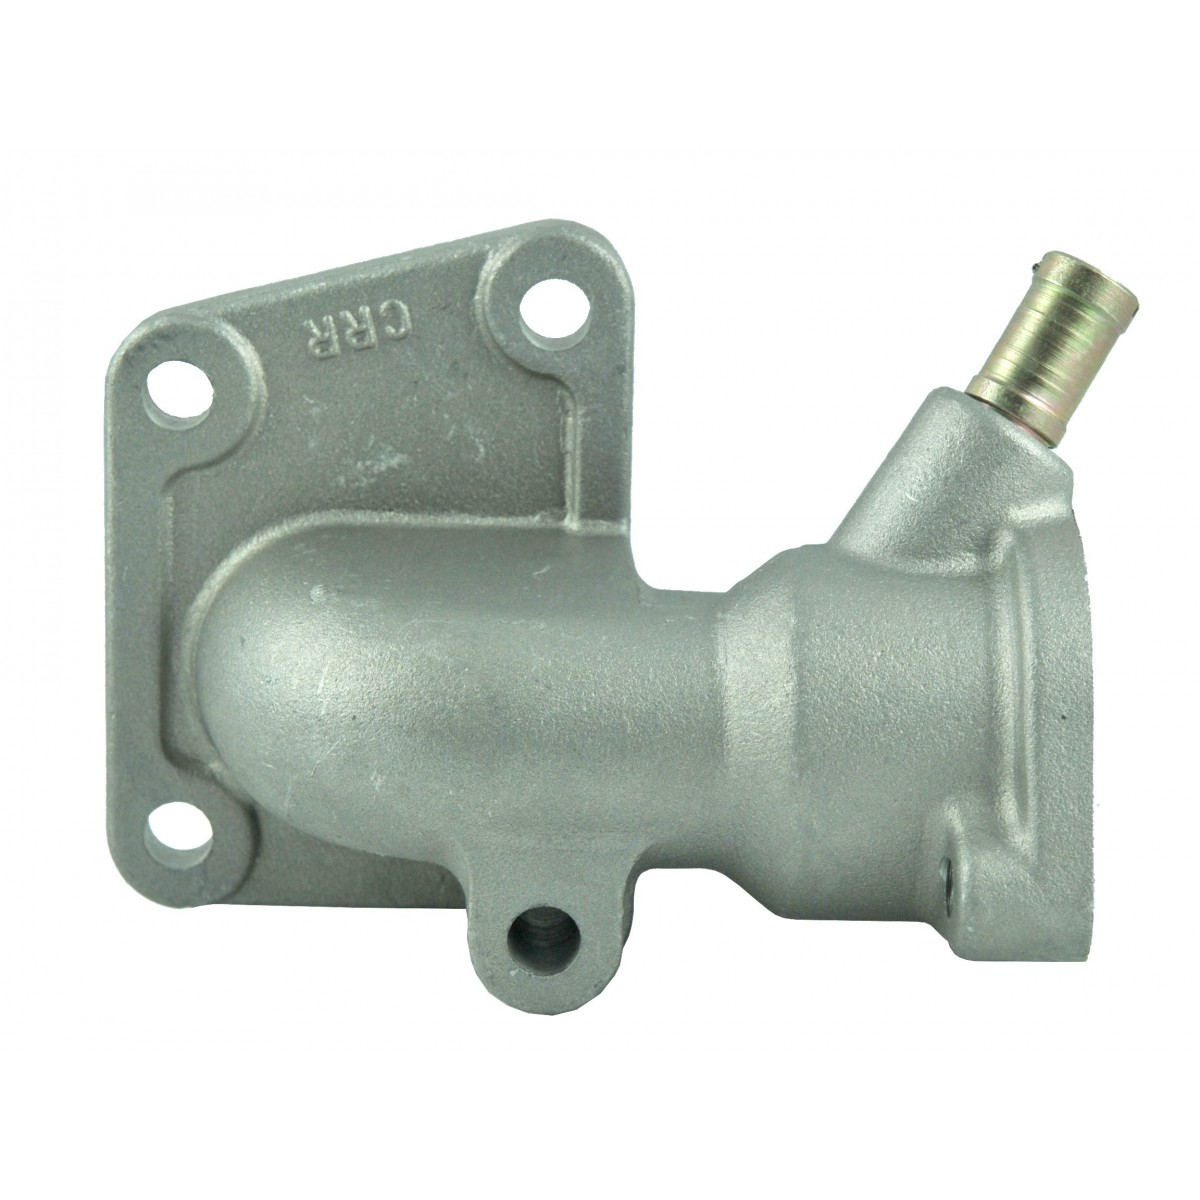 Water Valve Flange Kubota L1802-L4202, 4hoel + pipe